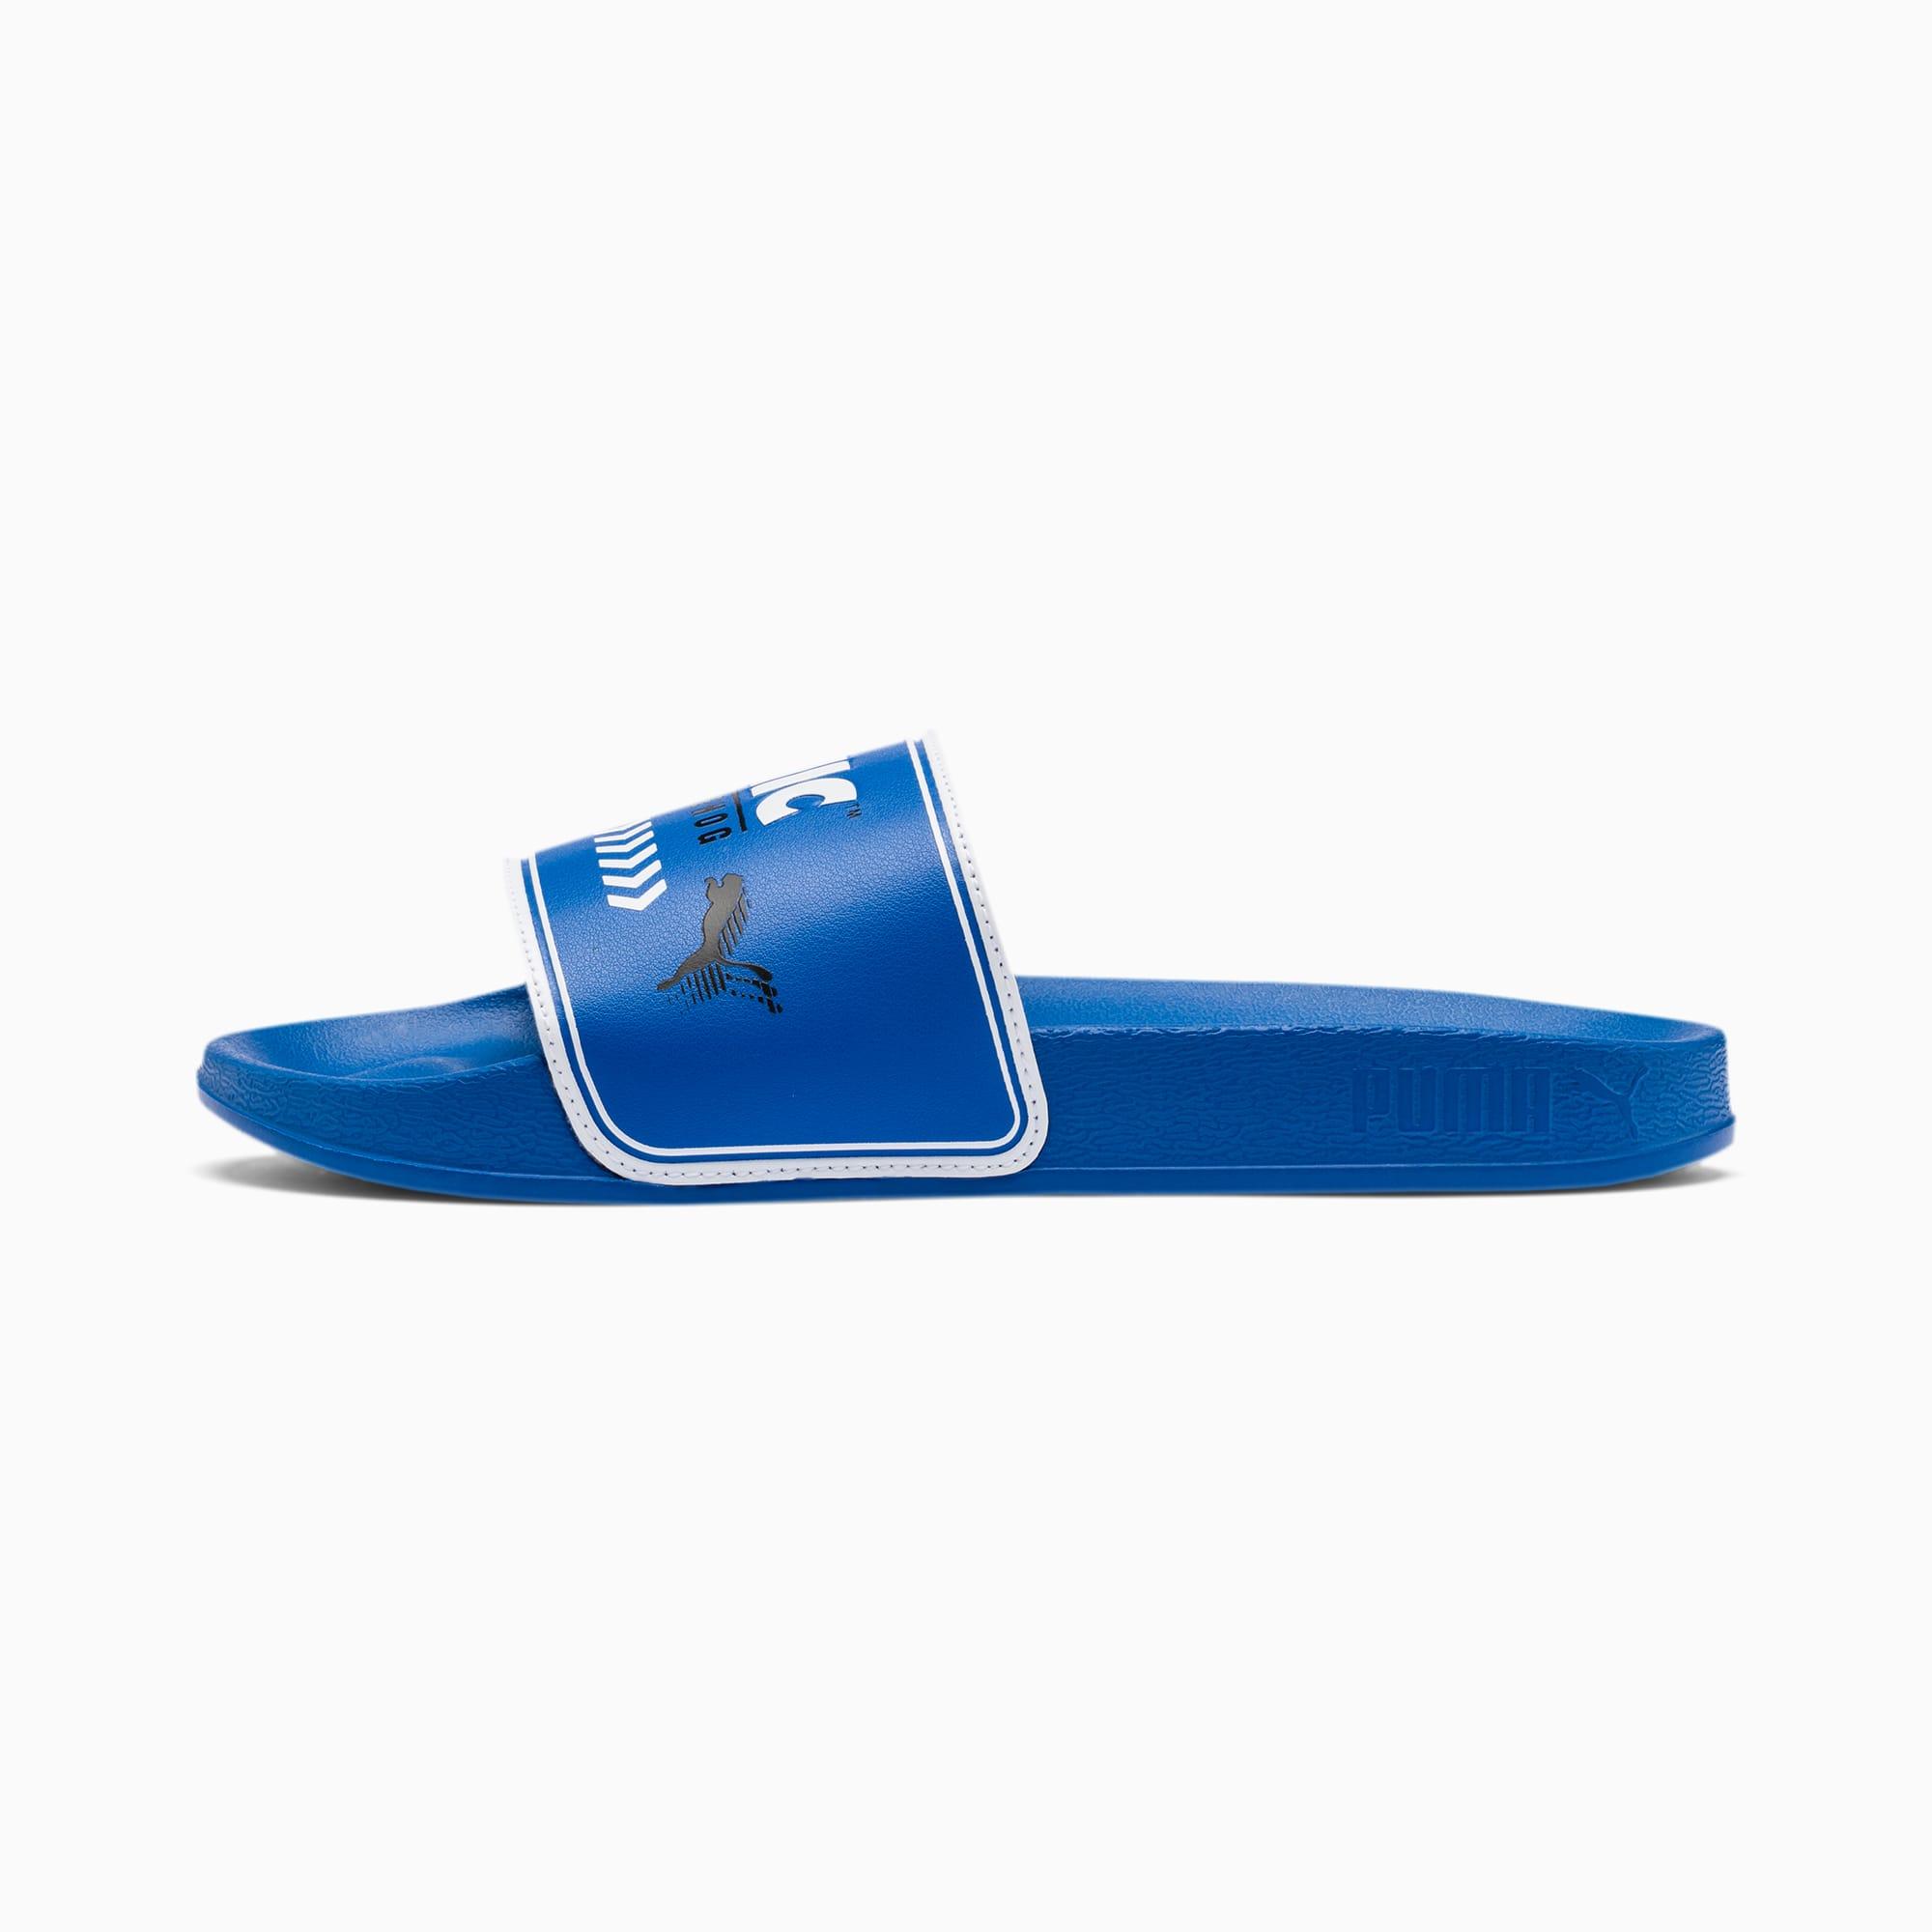 PUMA Sandale PUMA x SONIC Leadcat Youth pour Enfant, Taille 38, Chaussures